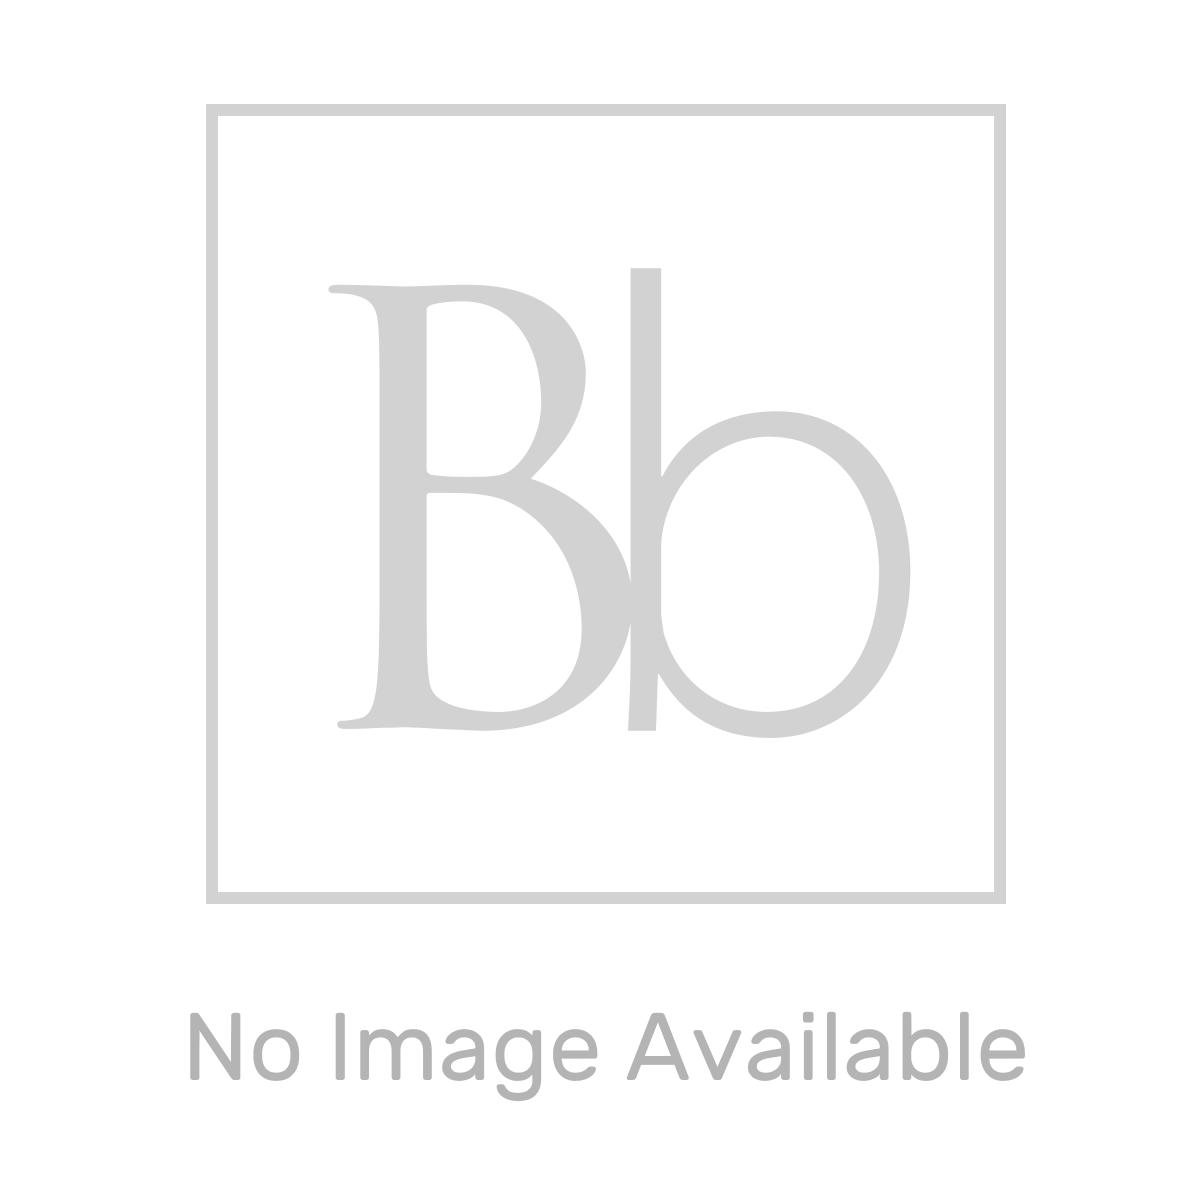 RAK Sensation Maxi Wall Hung Toilet with Soft Close Seat